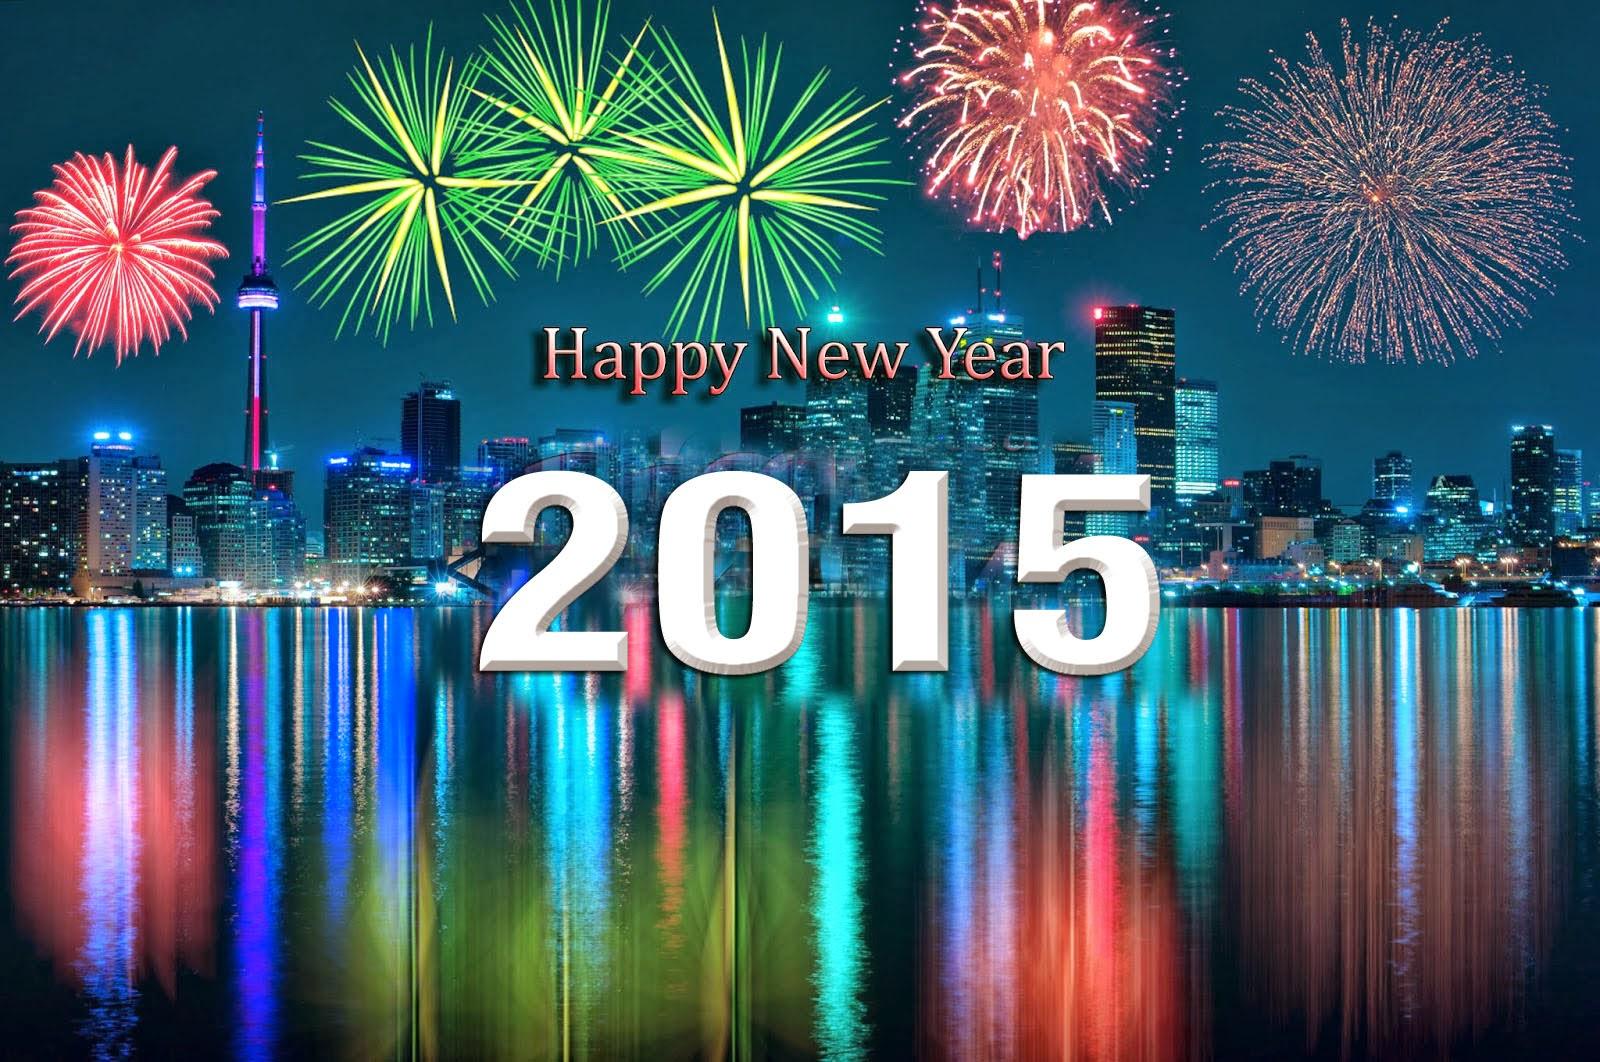 Happy-New-Year-hd-wallpaper-2015.jpg